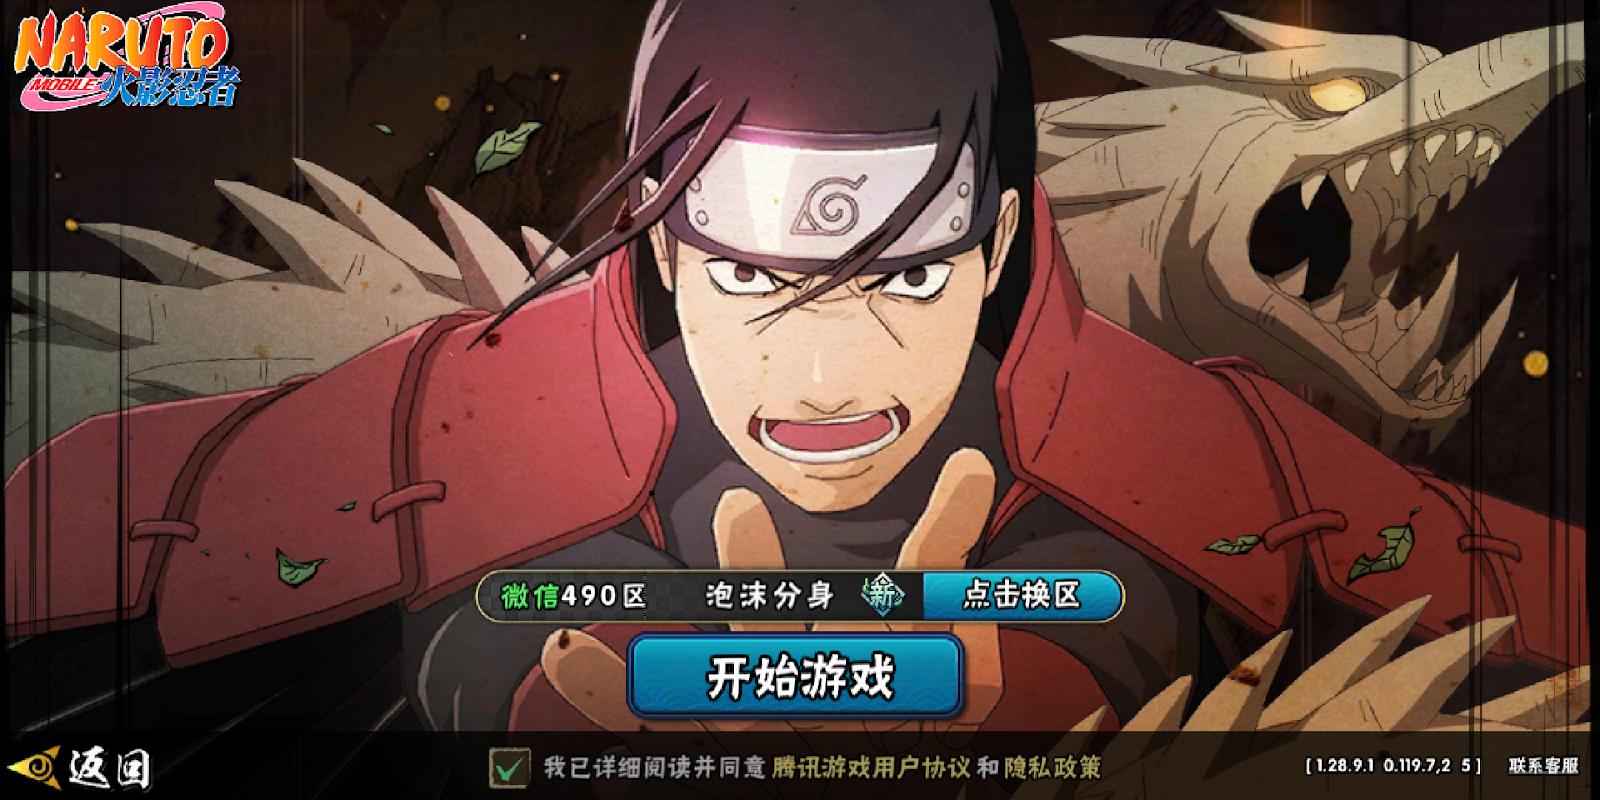 download game naruto mobile fighter apk offline